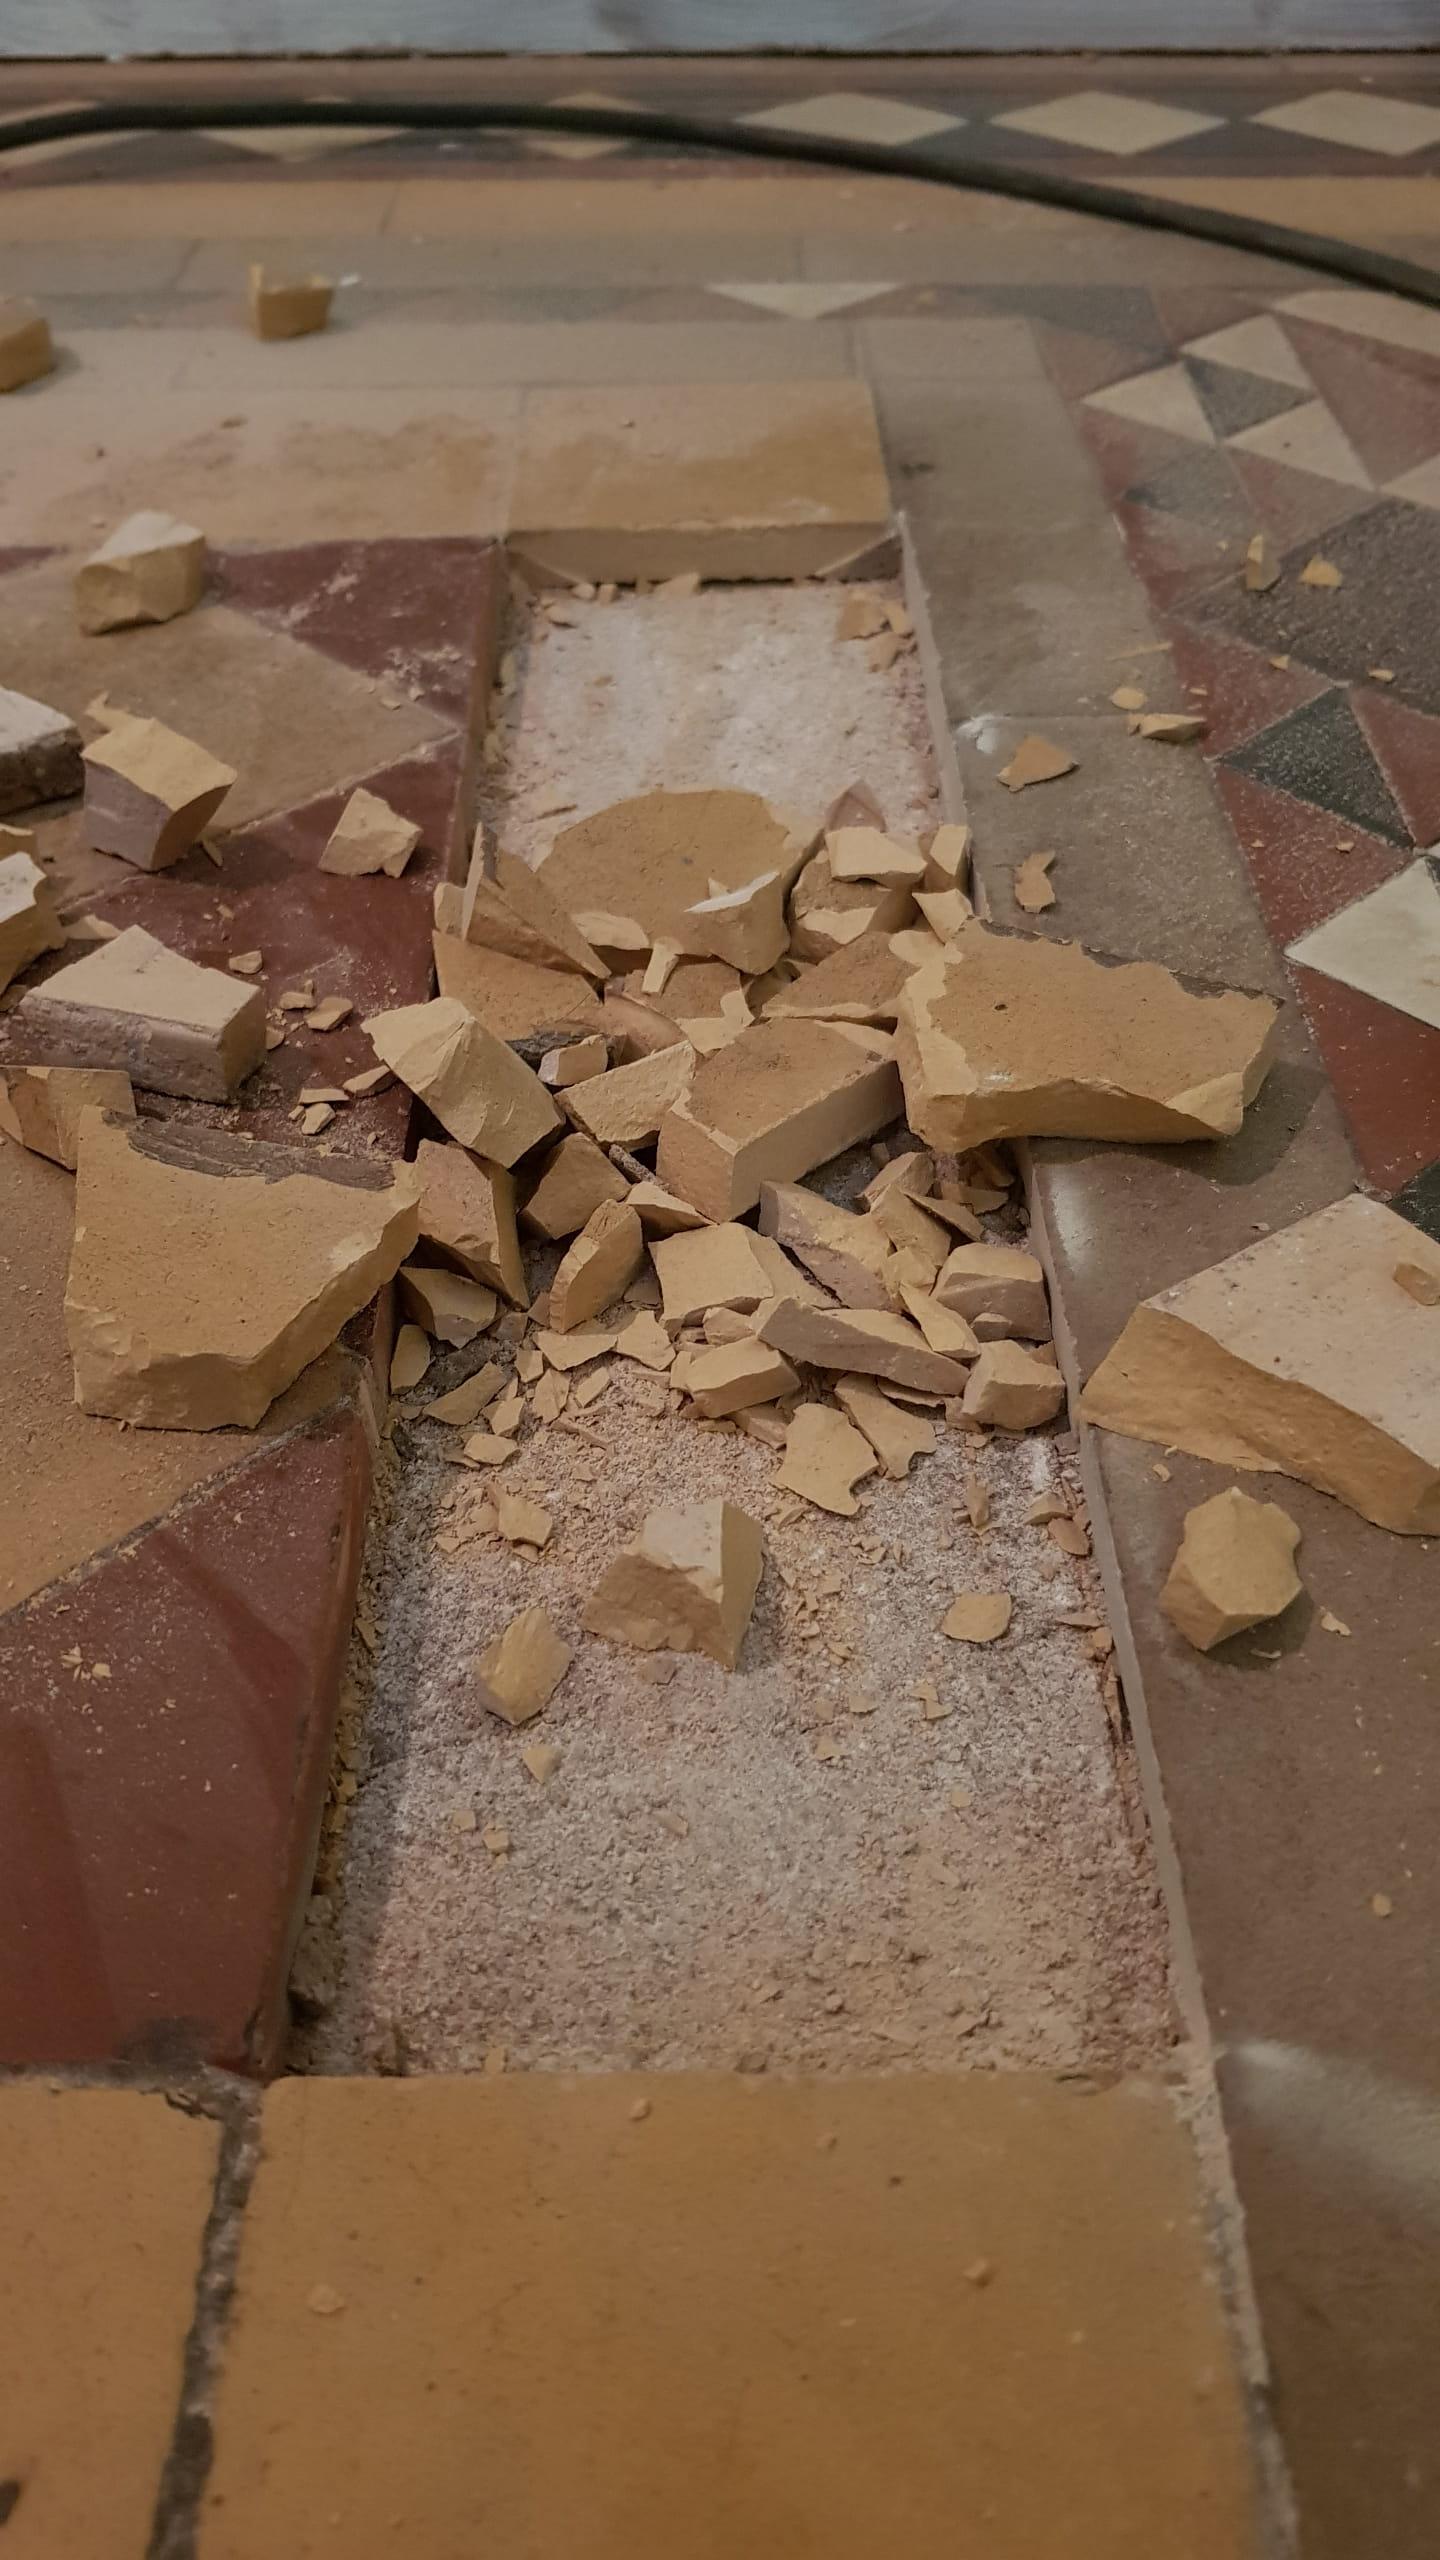 Victorian Hallway Showing Broken Tile Removal Doncaster Railway Property